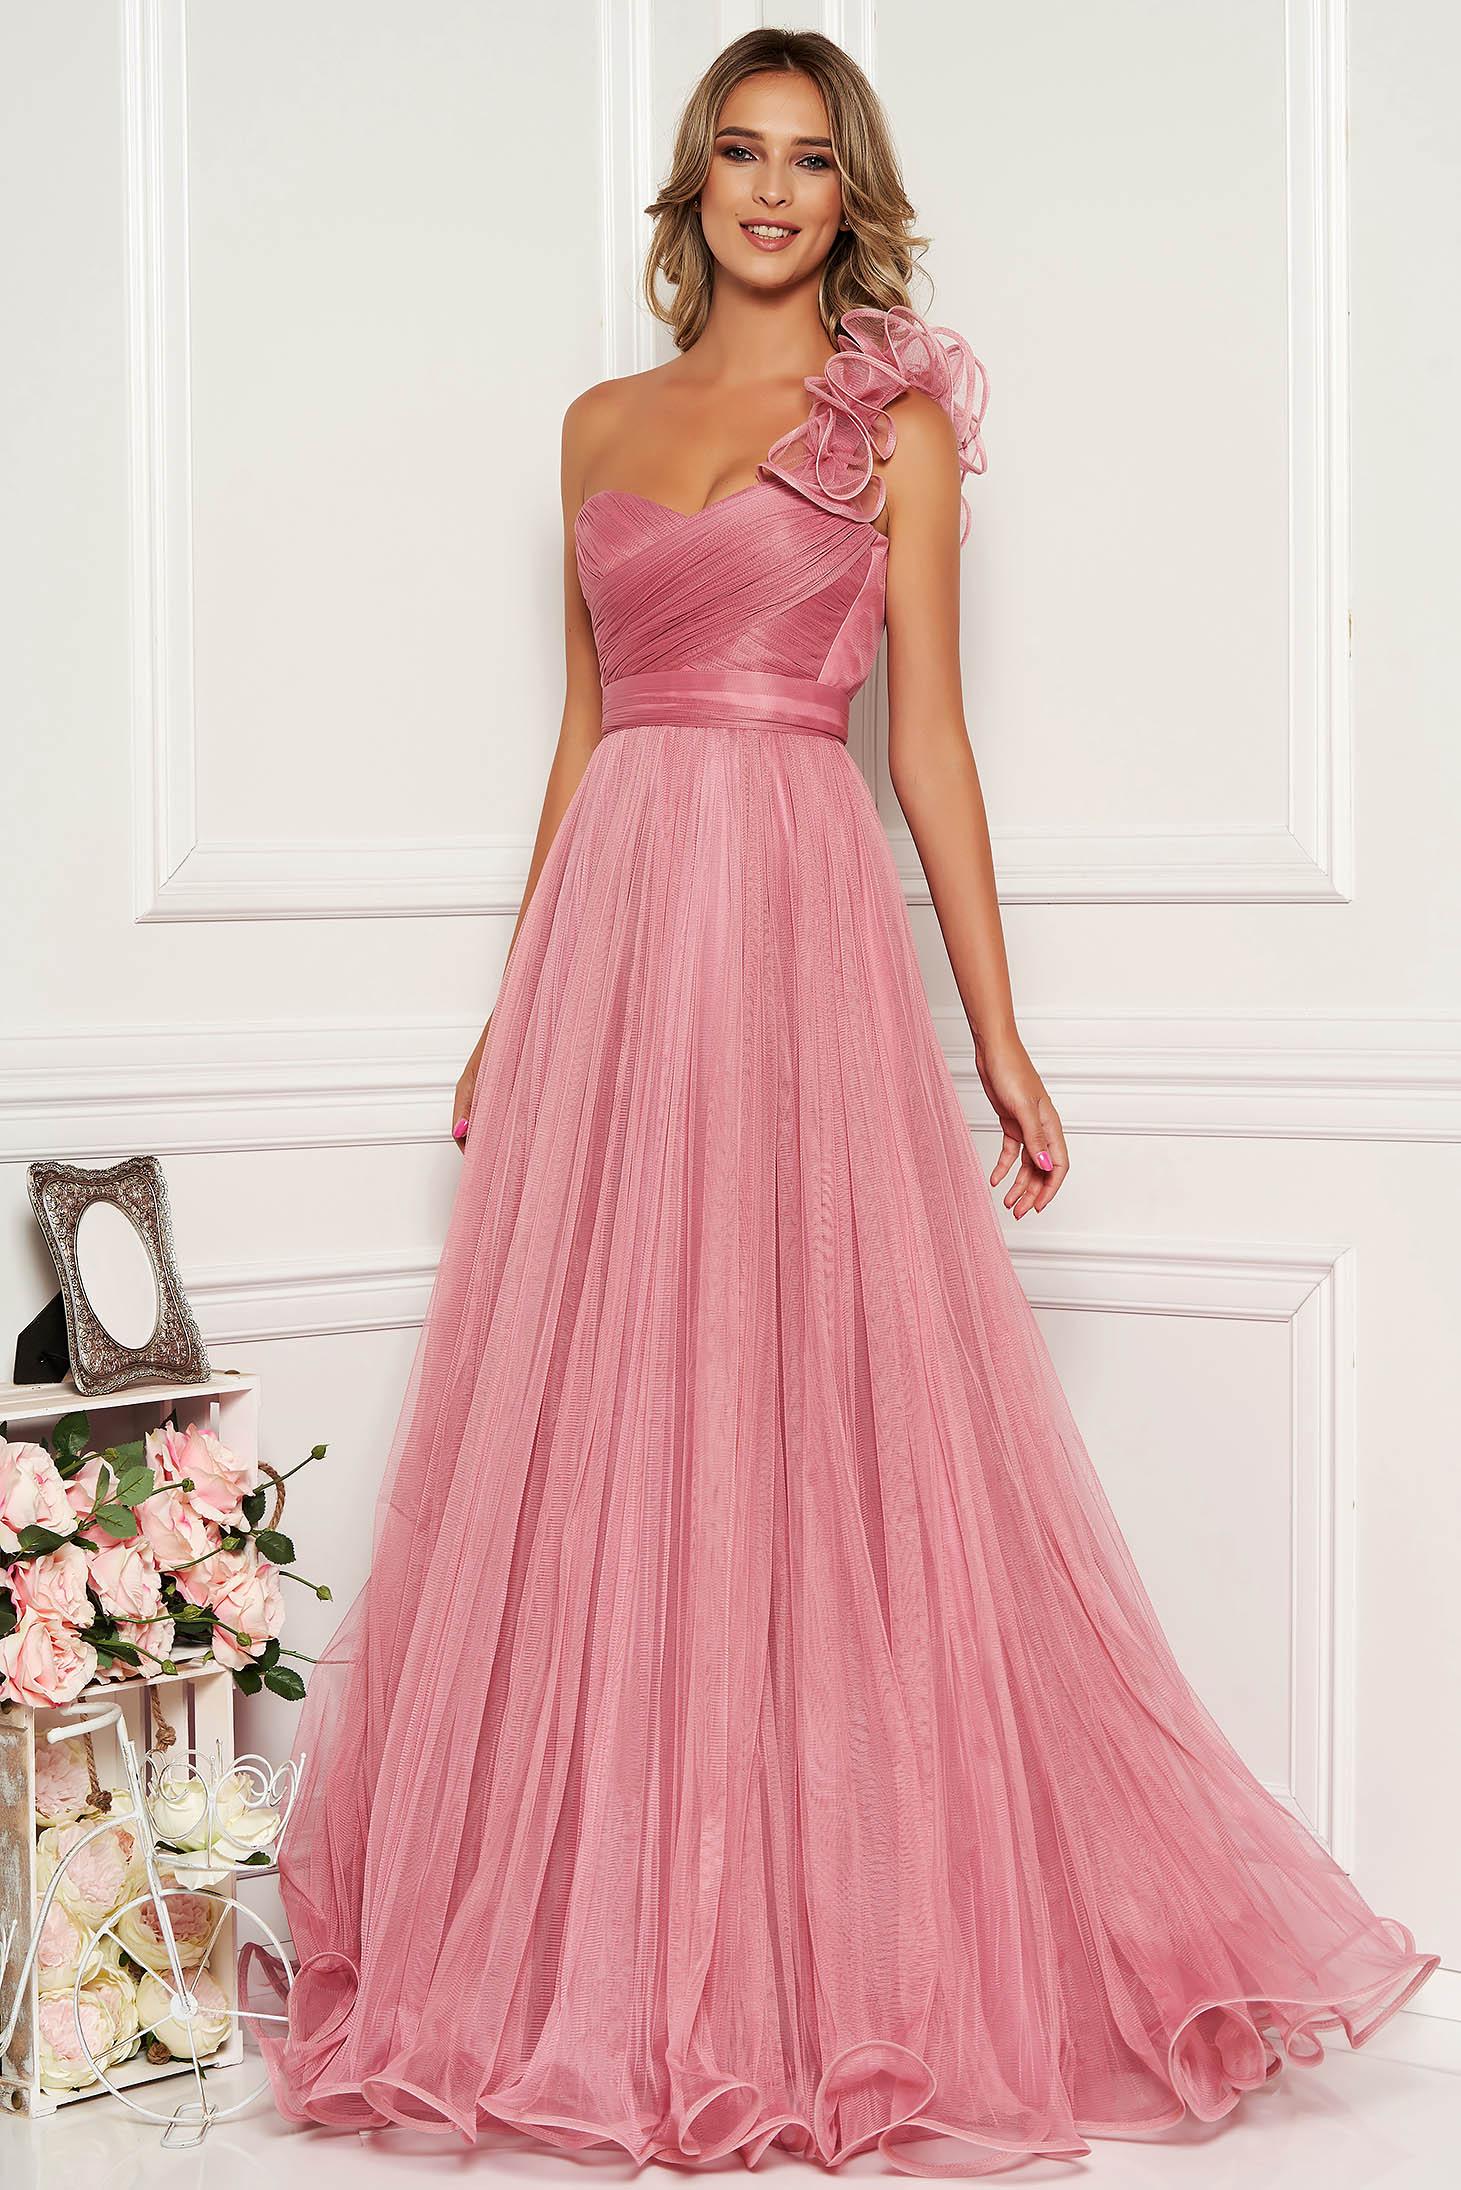 Rochie Ana Radu roz de lux lunga din tul cu croi in clos cu bust buretat si inchidere la spate tip corset